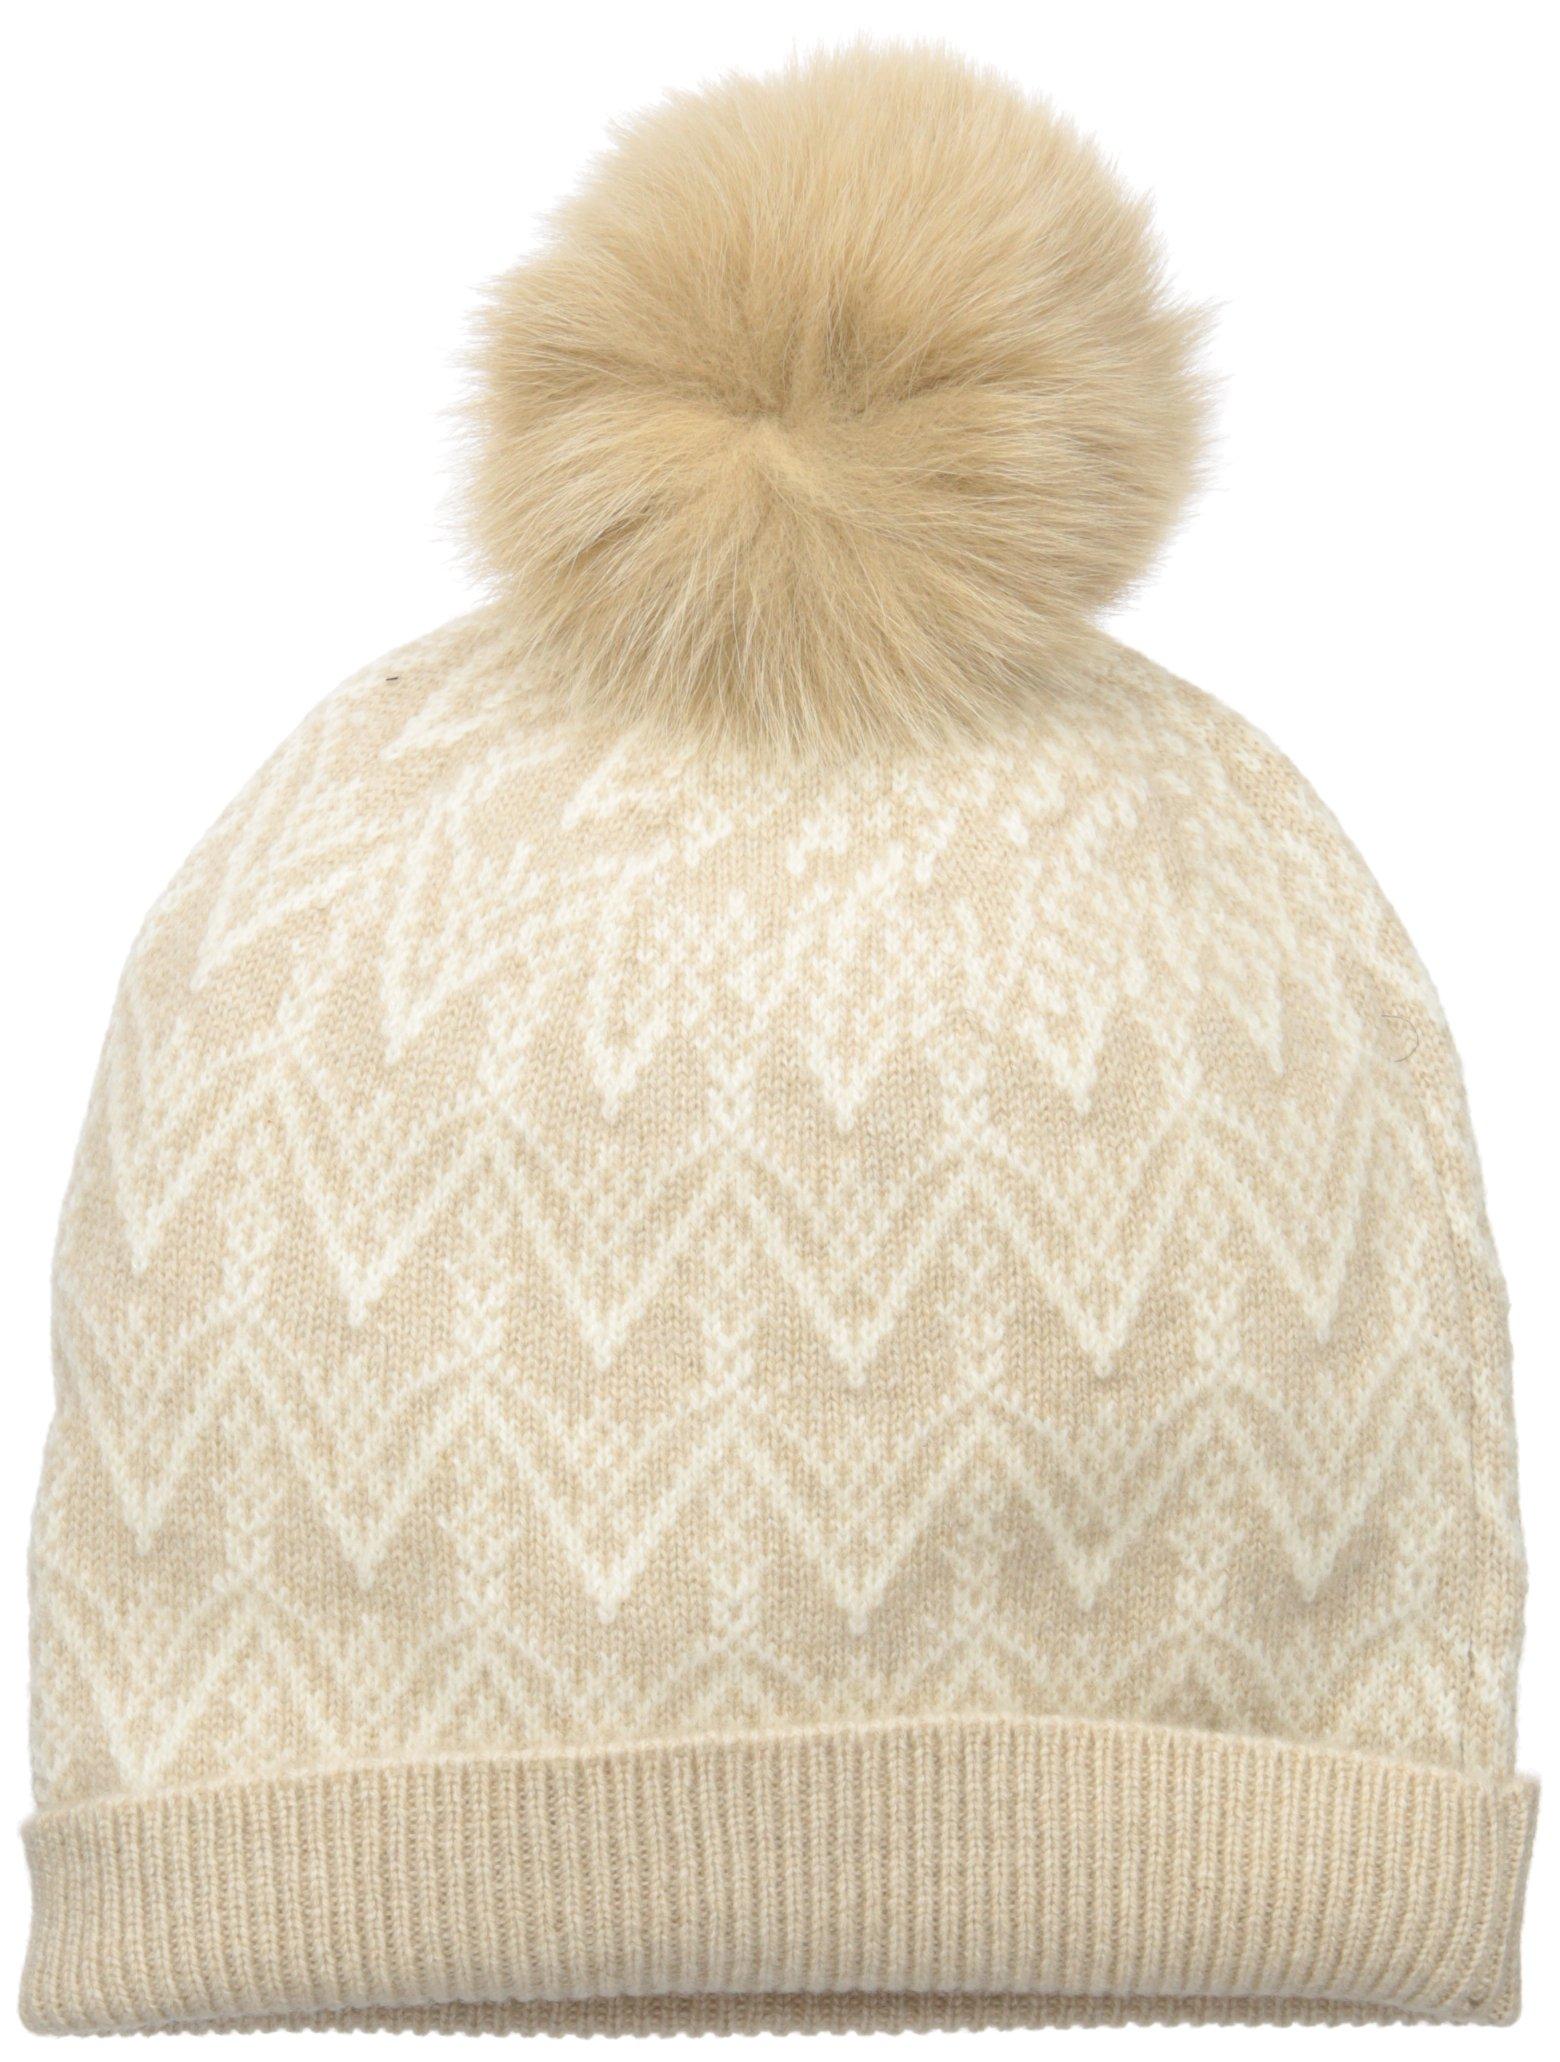 Sofia Cashmere Women's 100% Cashmere Fairisle Hat with Fox Fur Pom, Oatmeal/Ivory, One